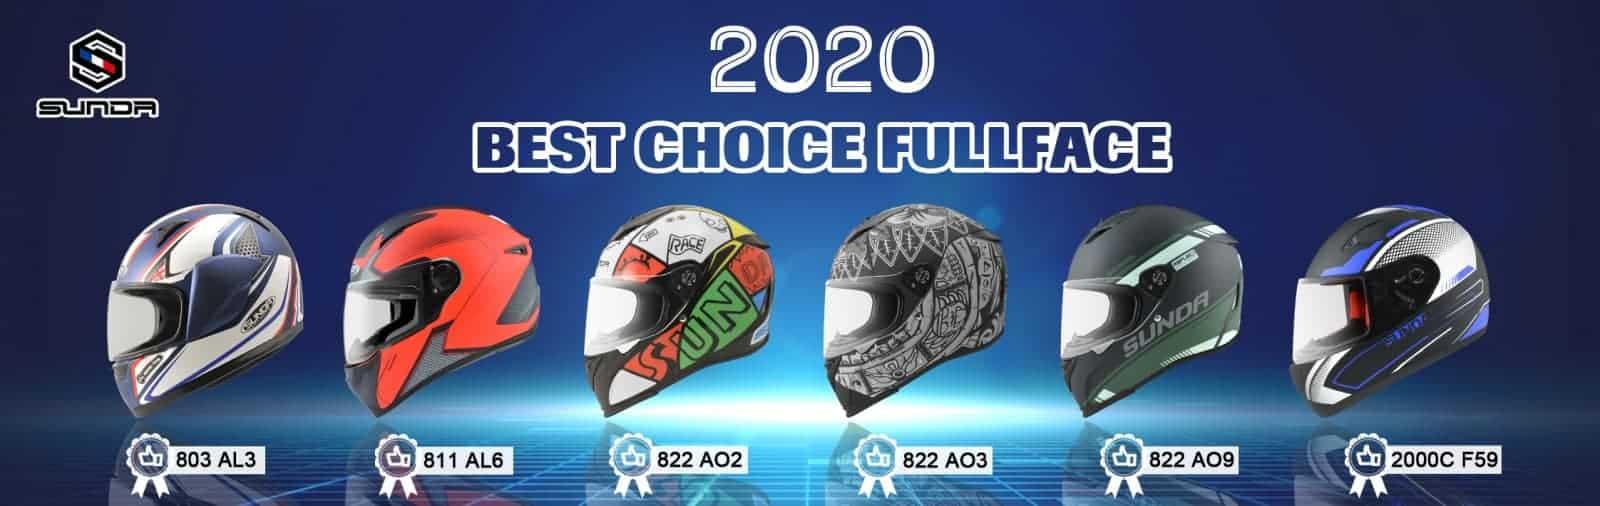 2020 Best Ff